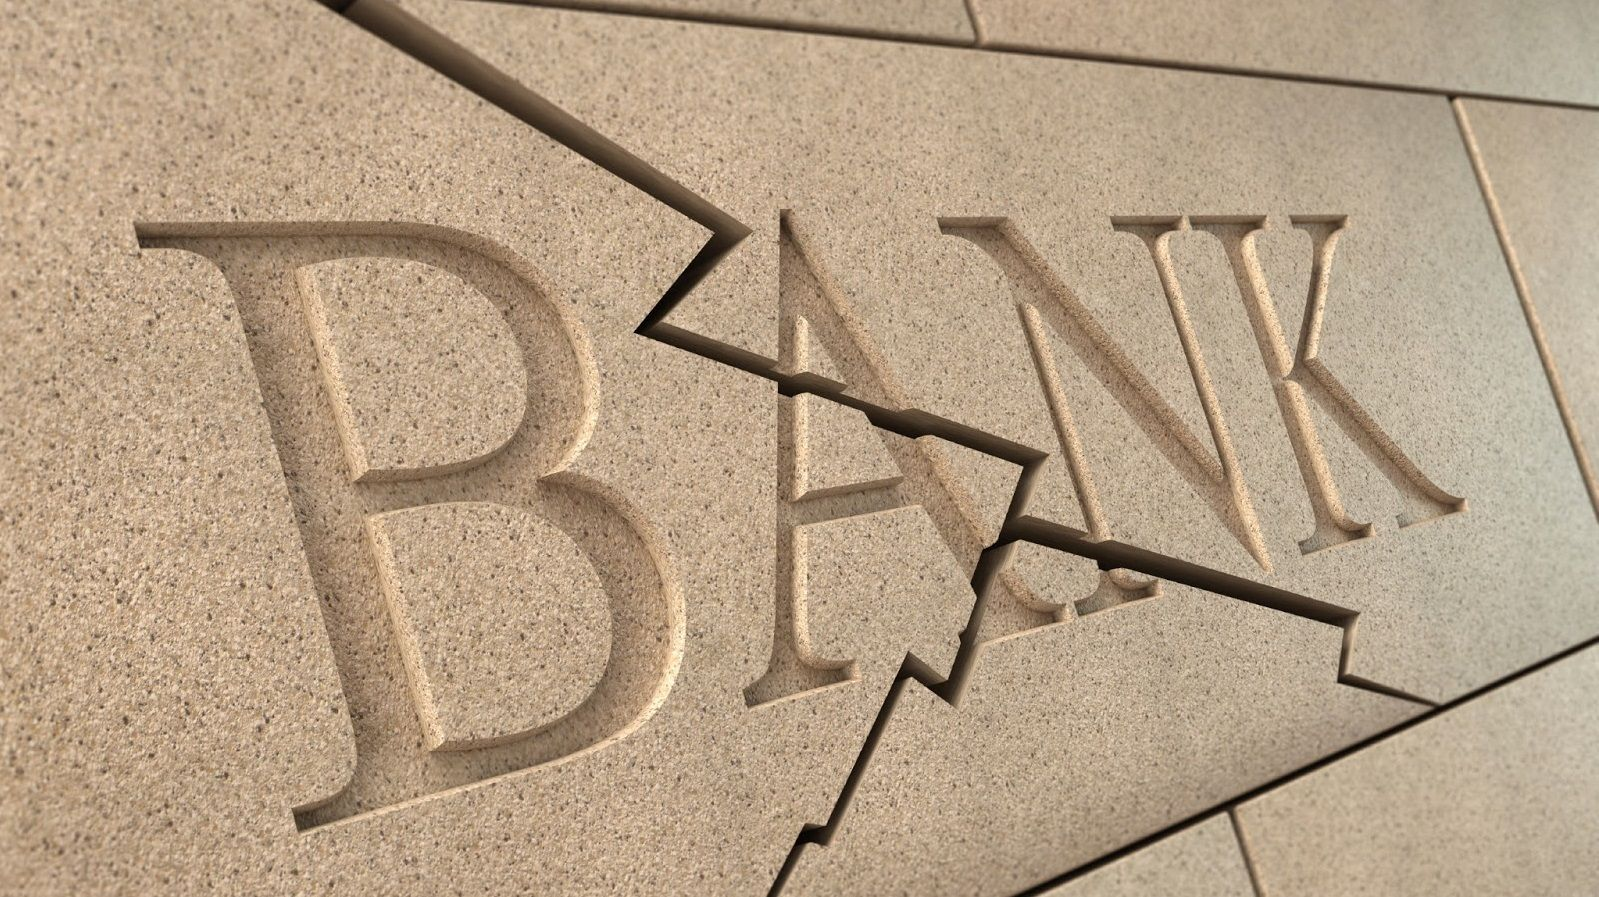 Объем теневого банковского сектора вмире вырос до $45трлн- Kapital.kz